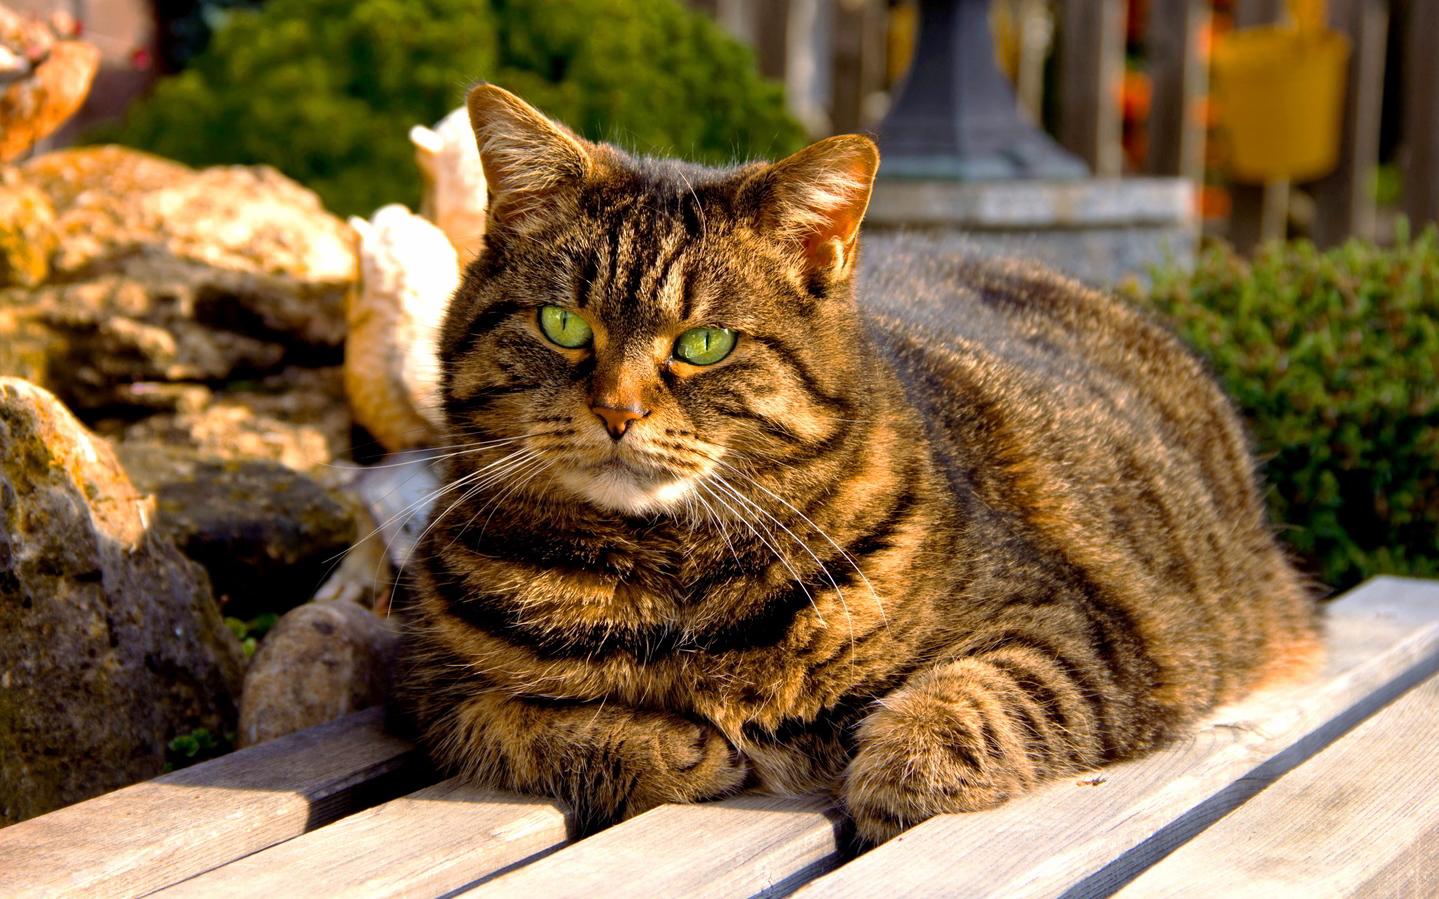 Fluffy fat cat